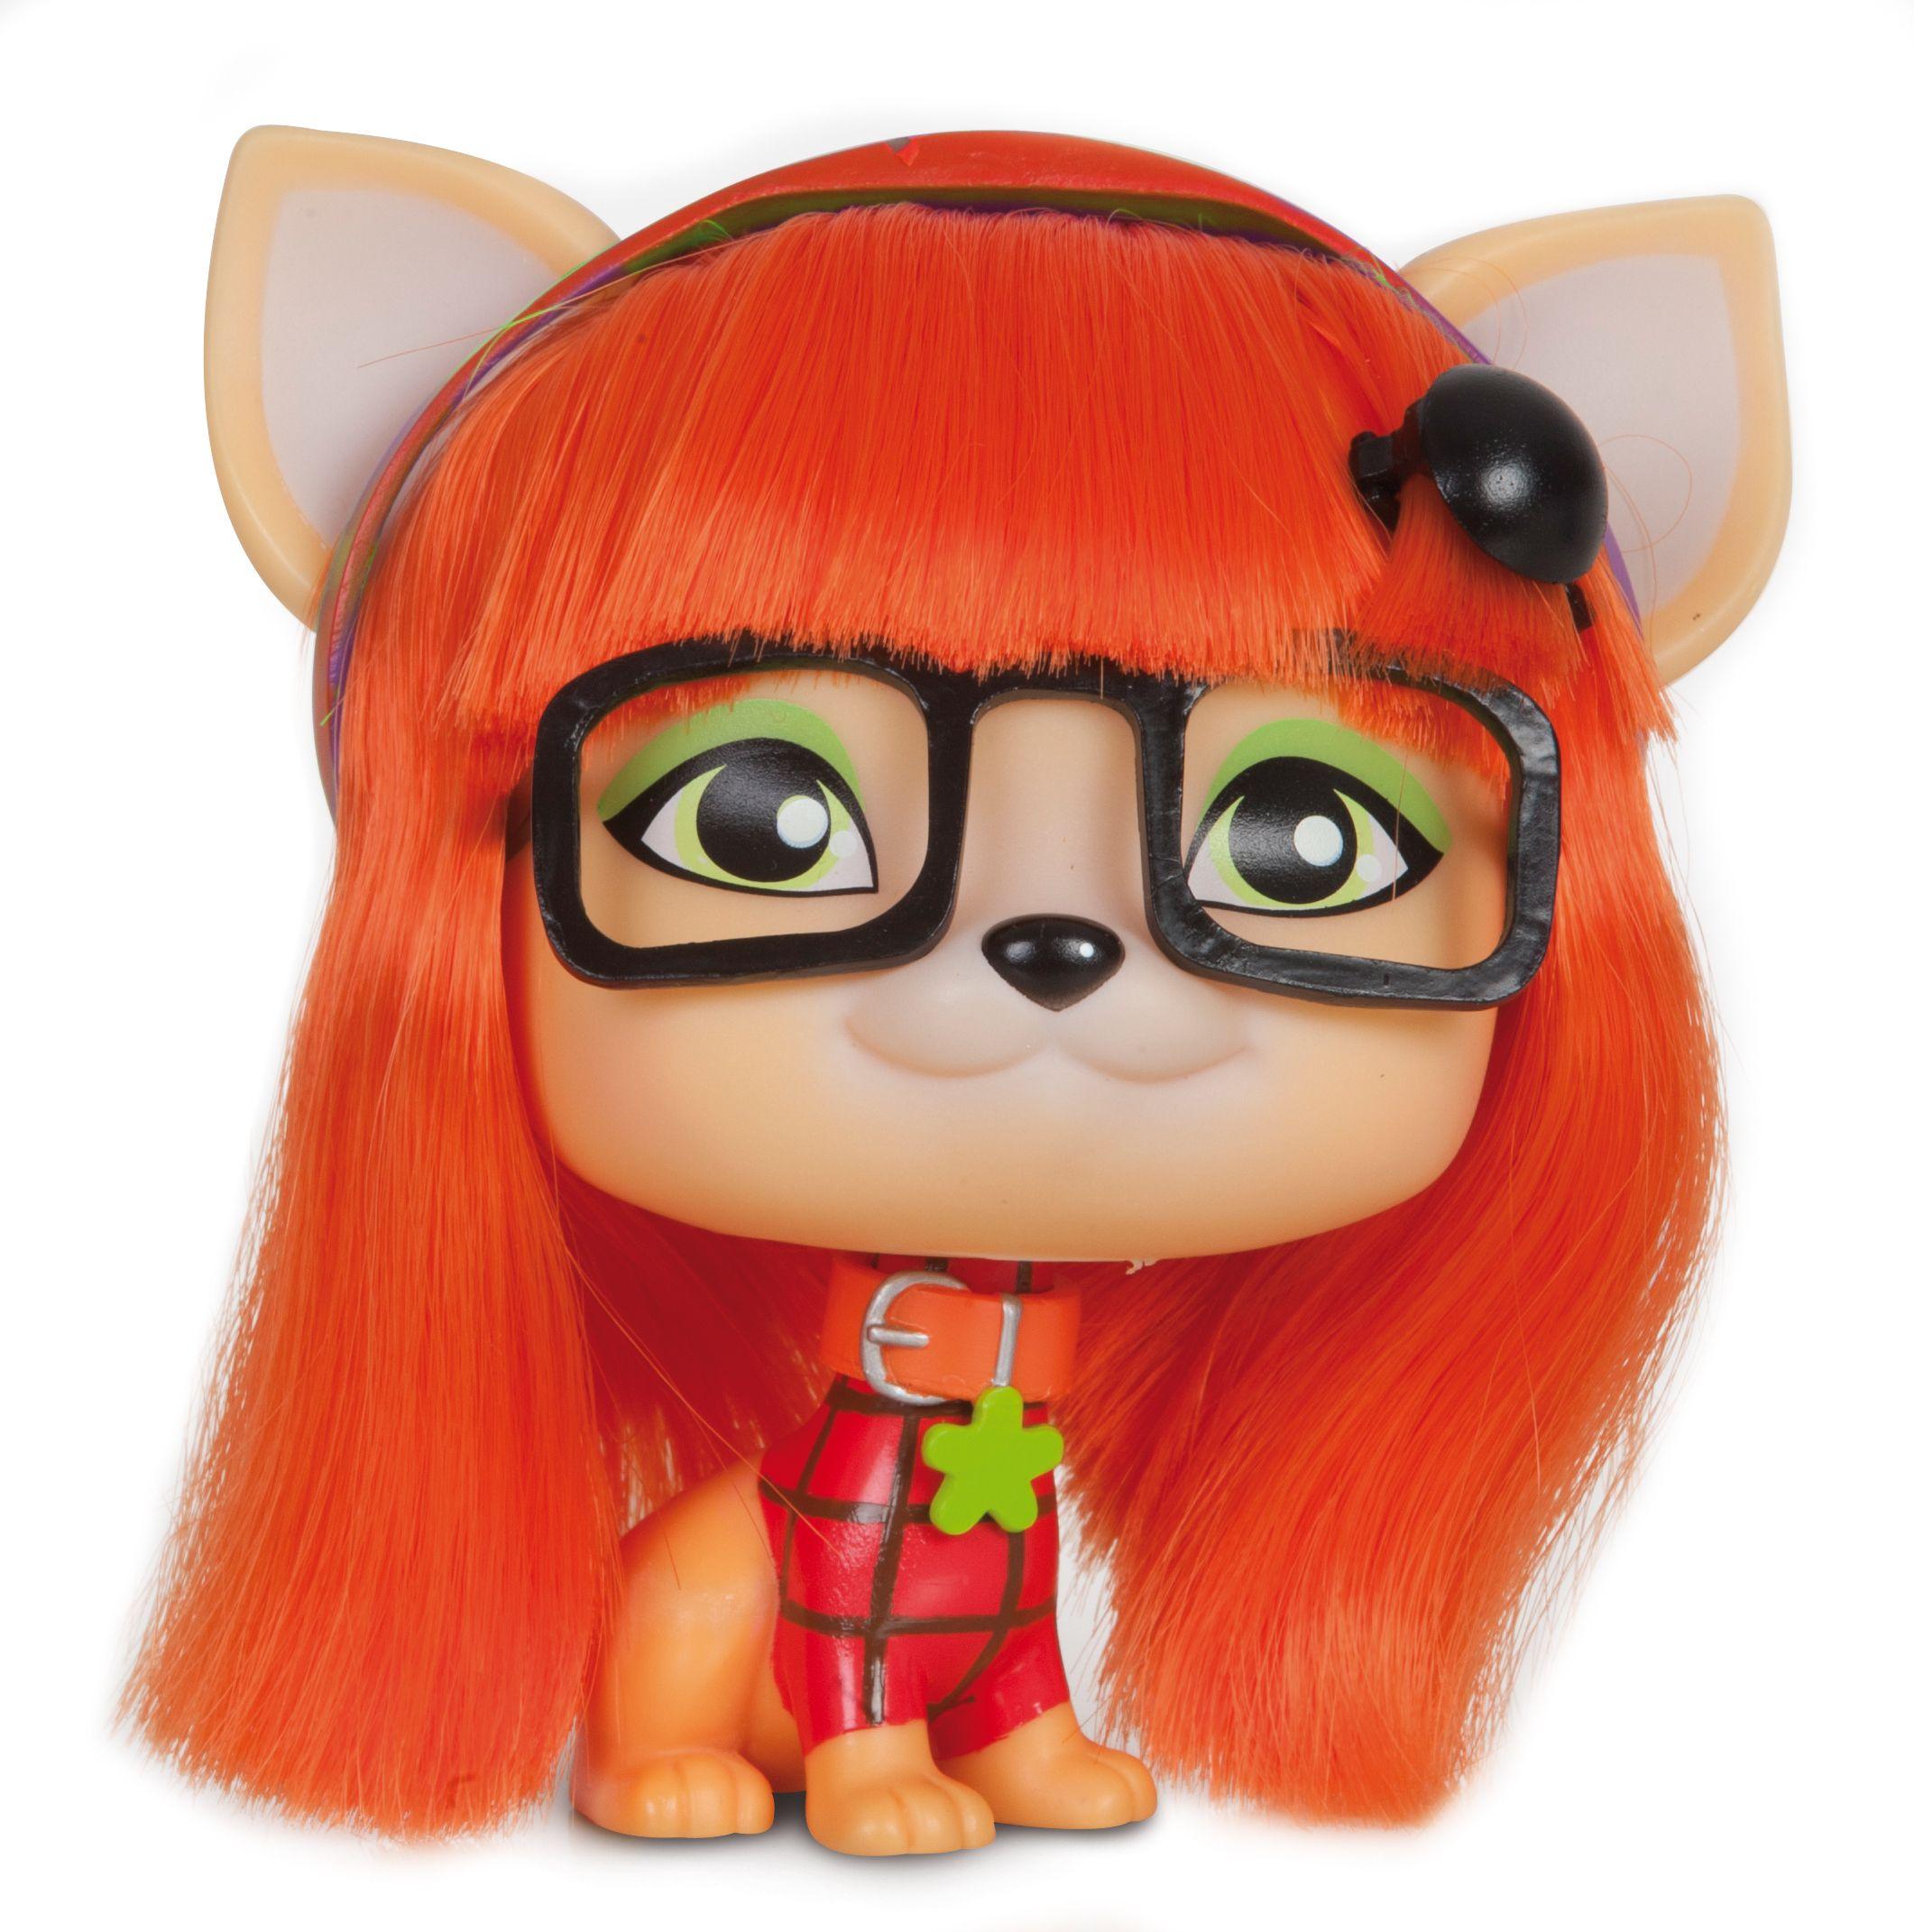 Alex Vip Pet Most Popular Kids Toys Popular Kids Toys